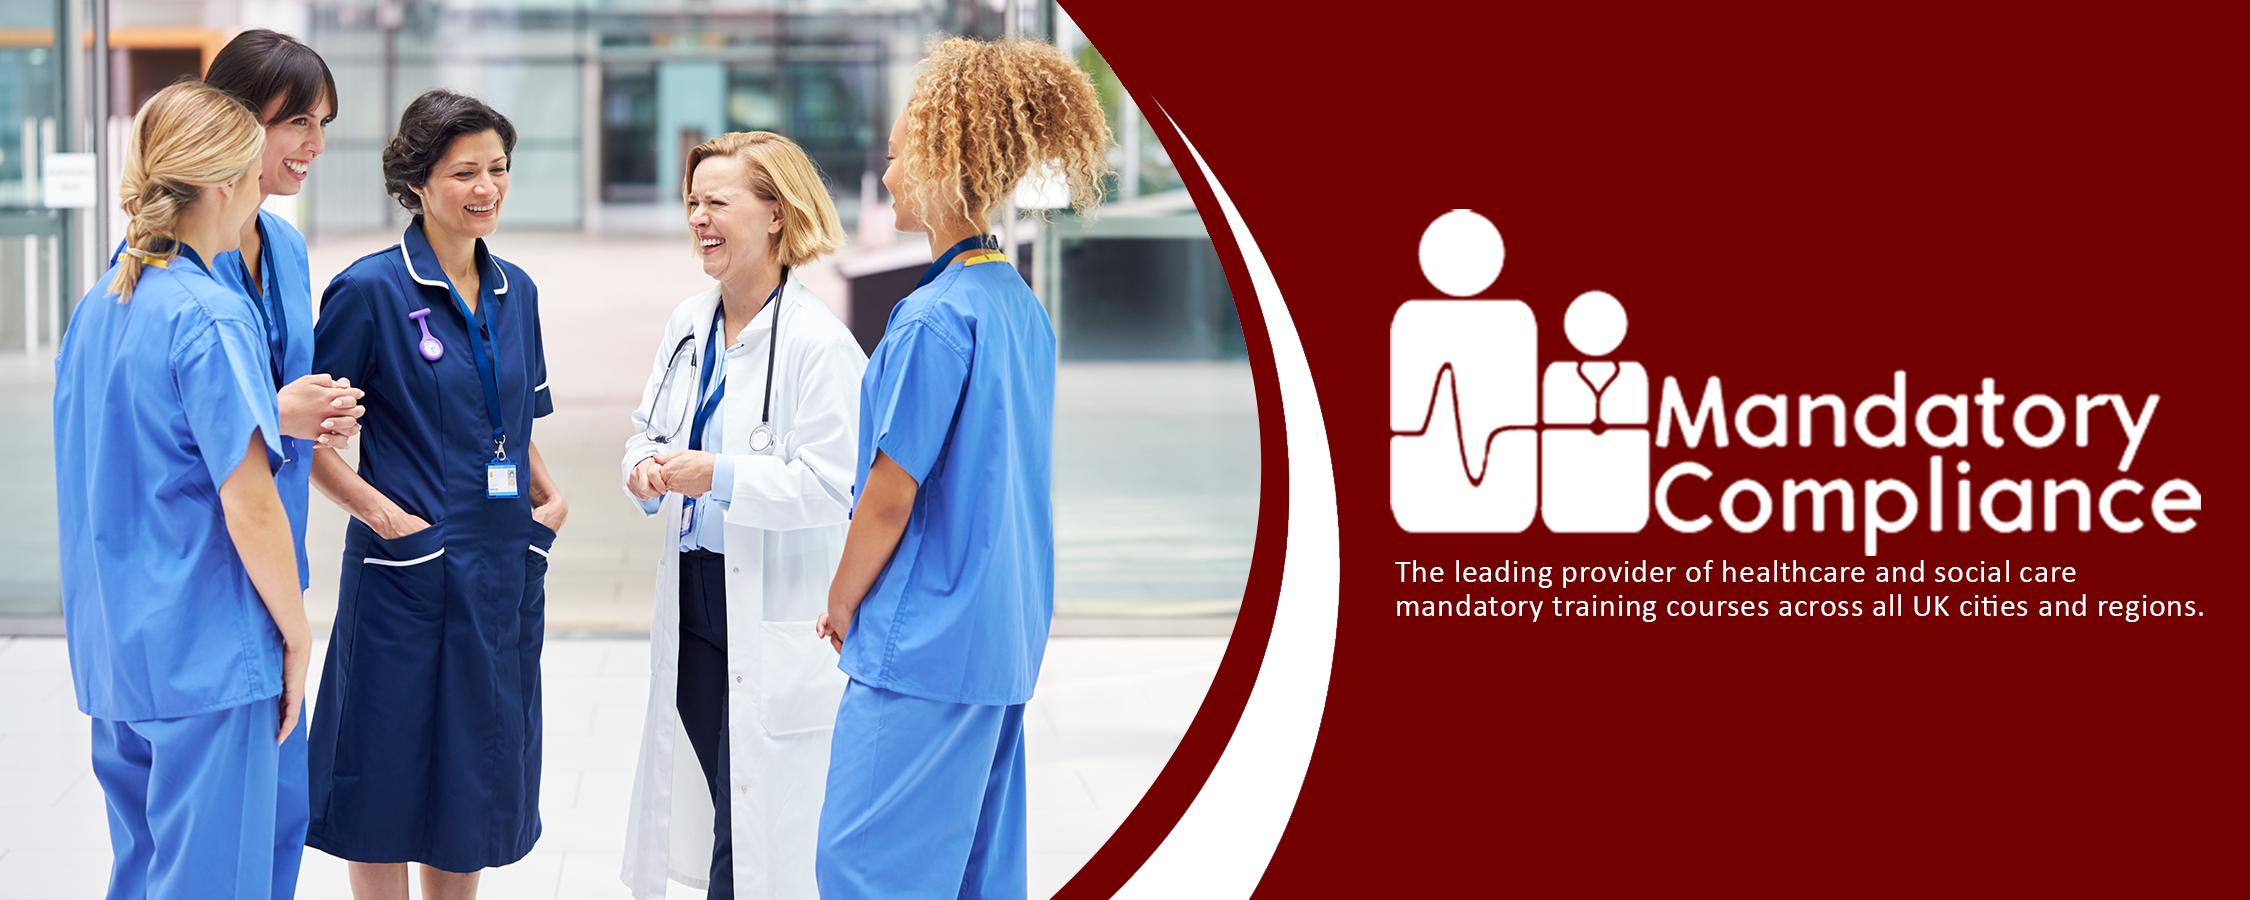 Paediatric First Aid Training - E-Learning Courses - Mandatory Compliance UK -